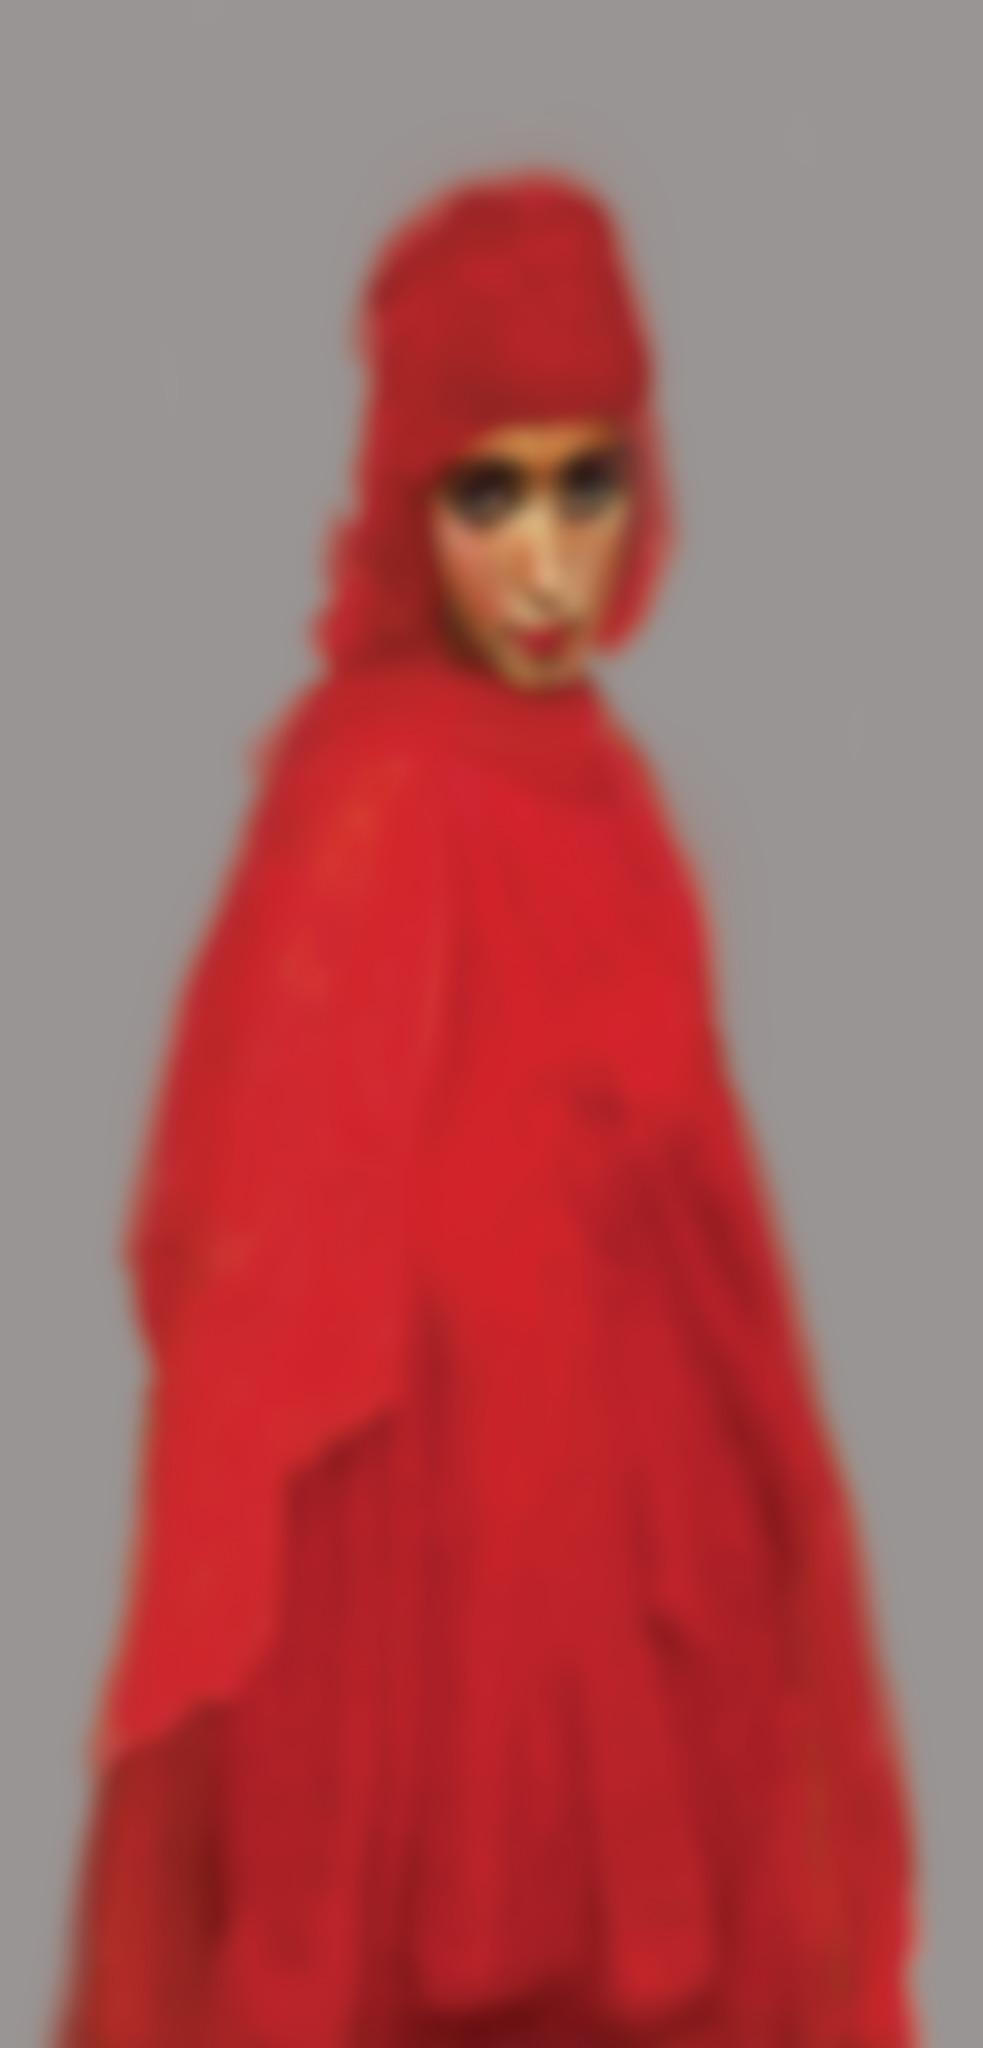 Halim AL KARIM (b. 1963)Photographic print Mounted on board225 x 100 cm - Edition 3 + 2 APONLINE CATALOGUE